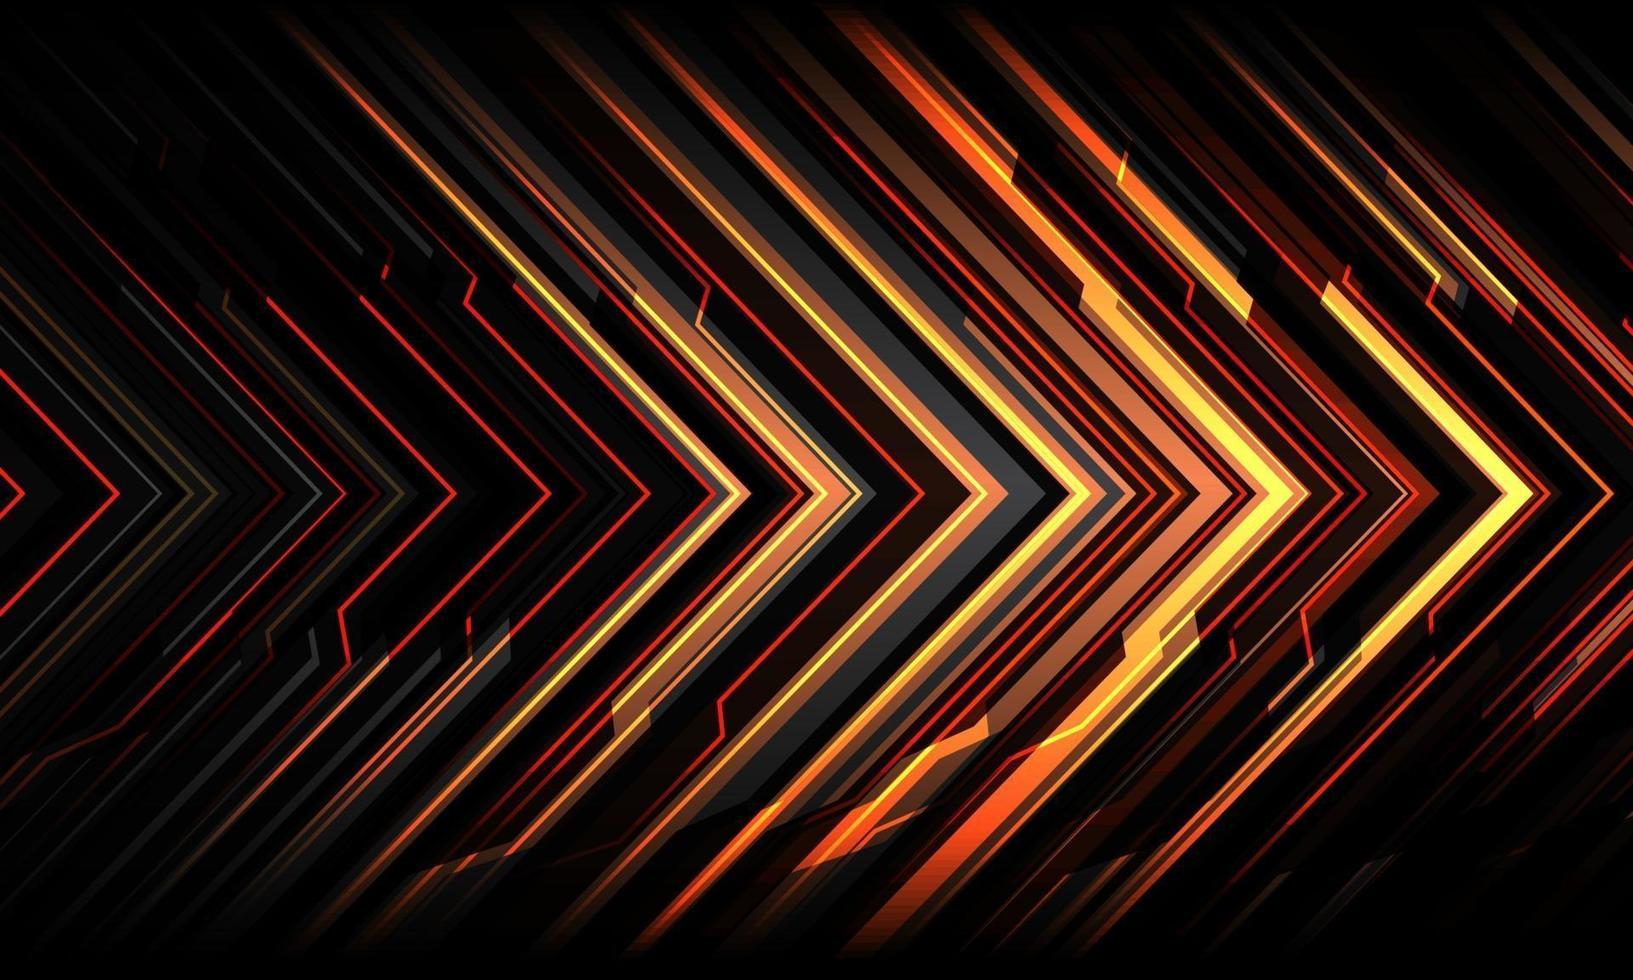 abstrakt röd gul svart pil linje krets ljus cyber geometrisk teknik futuristisk riktning design modern bakgrund vektorillustration. vektor